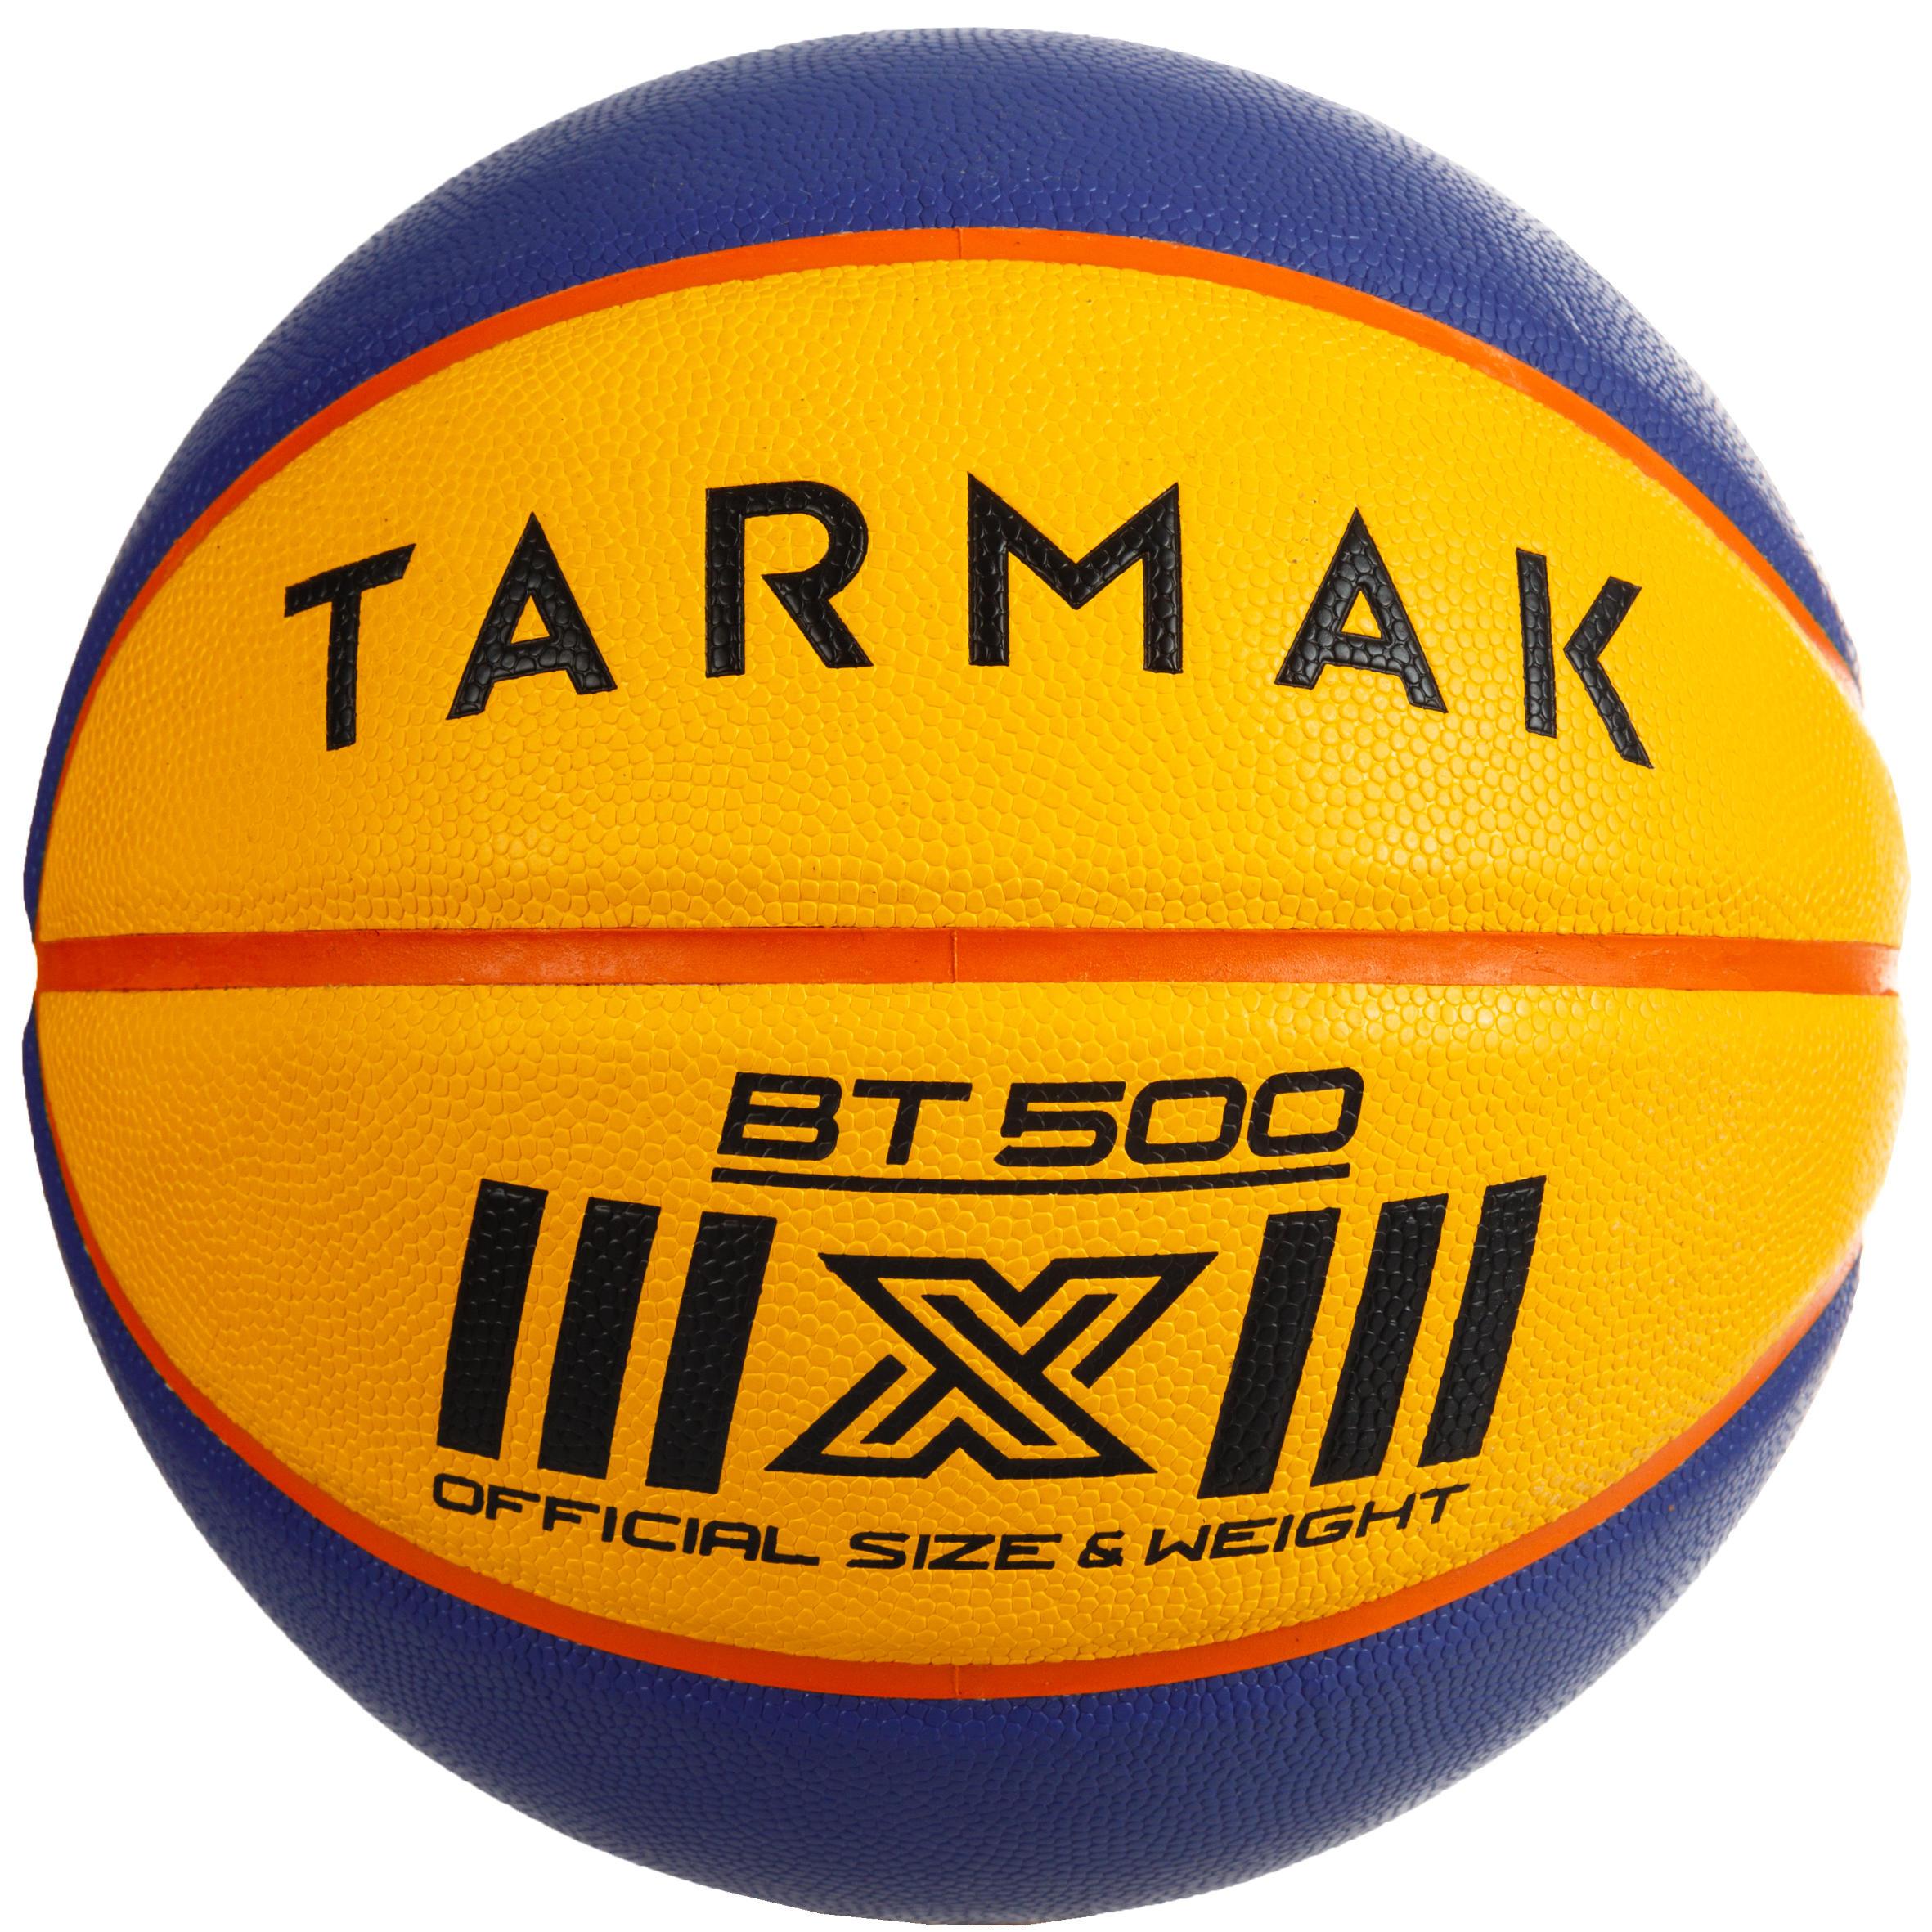 Tarmak Basketbal BT500 (3x3 basketbal)